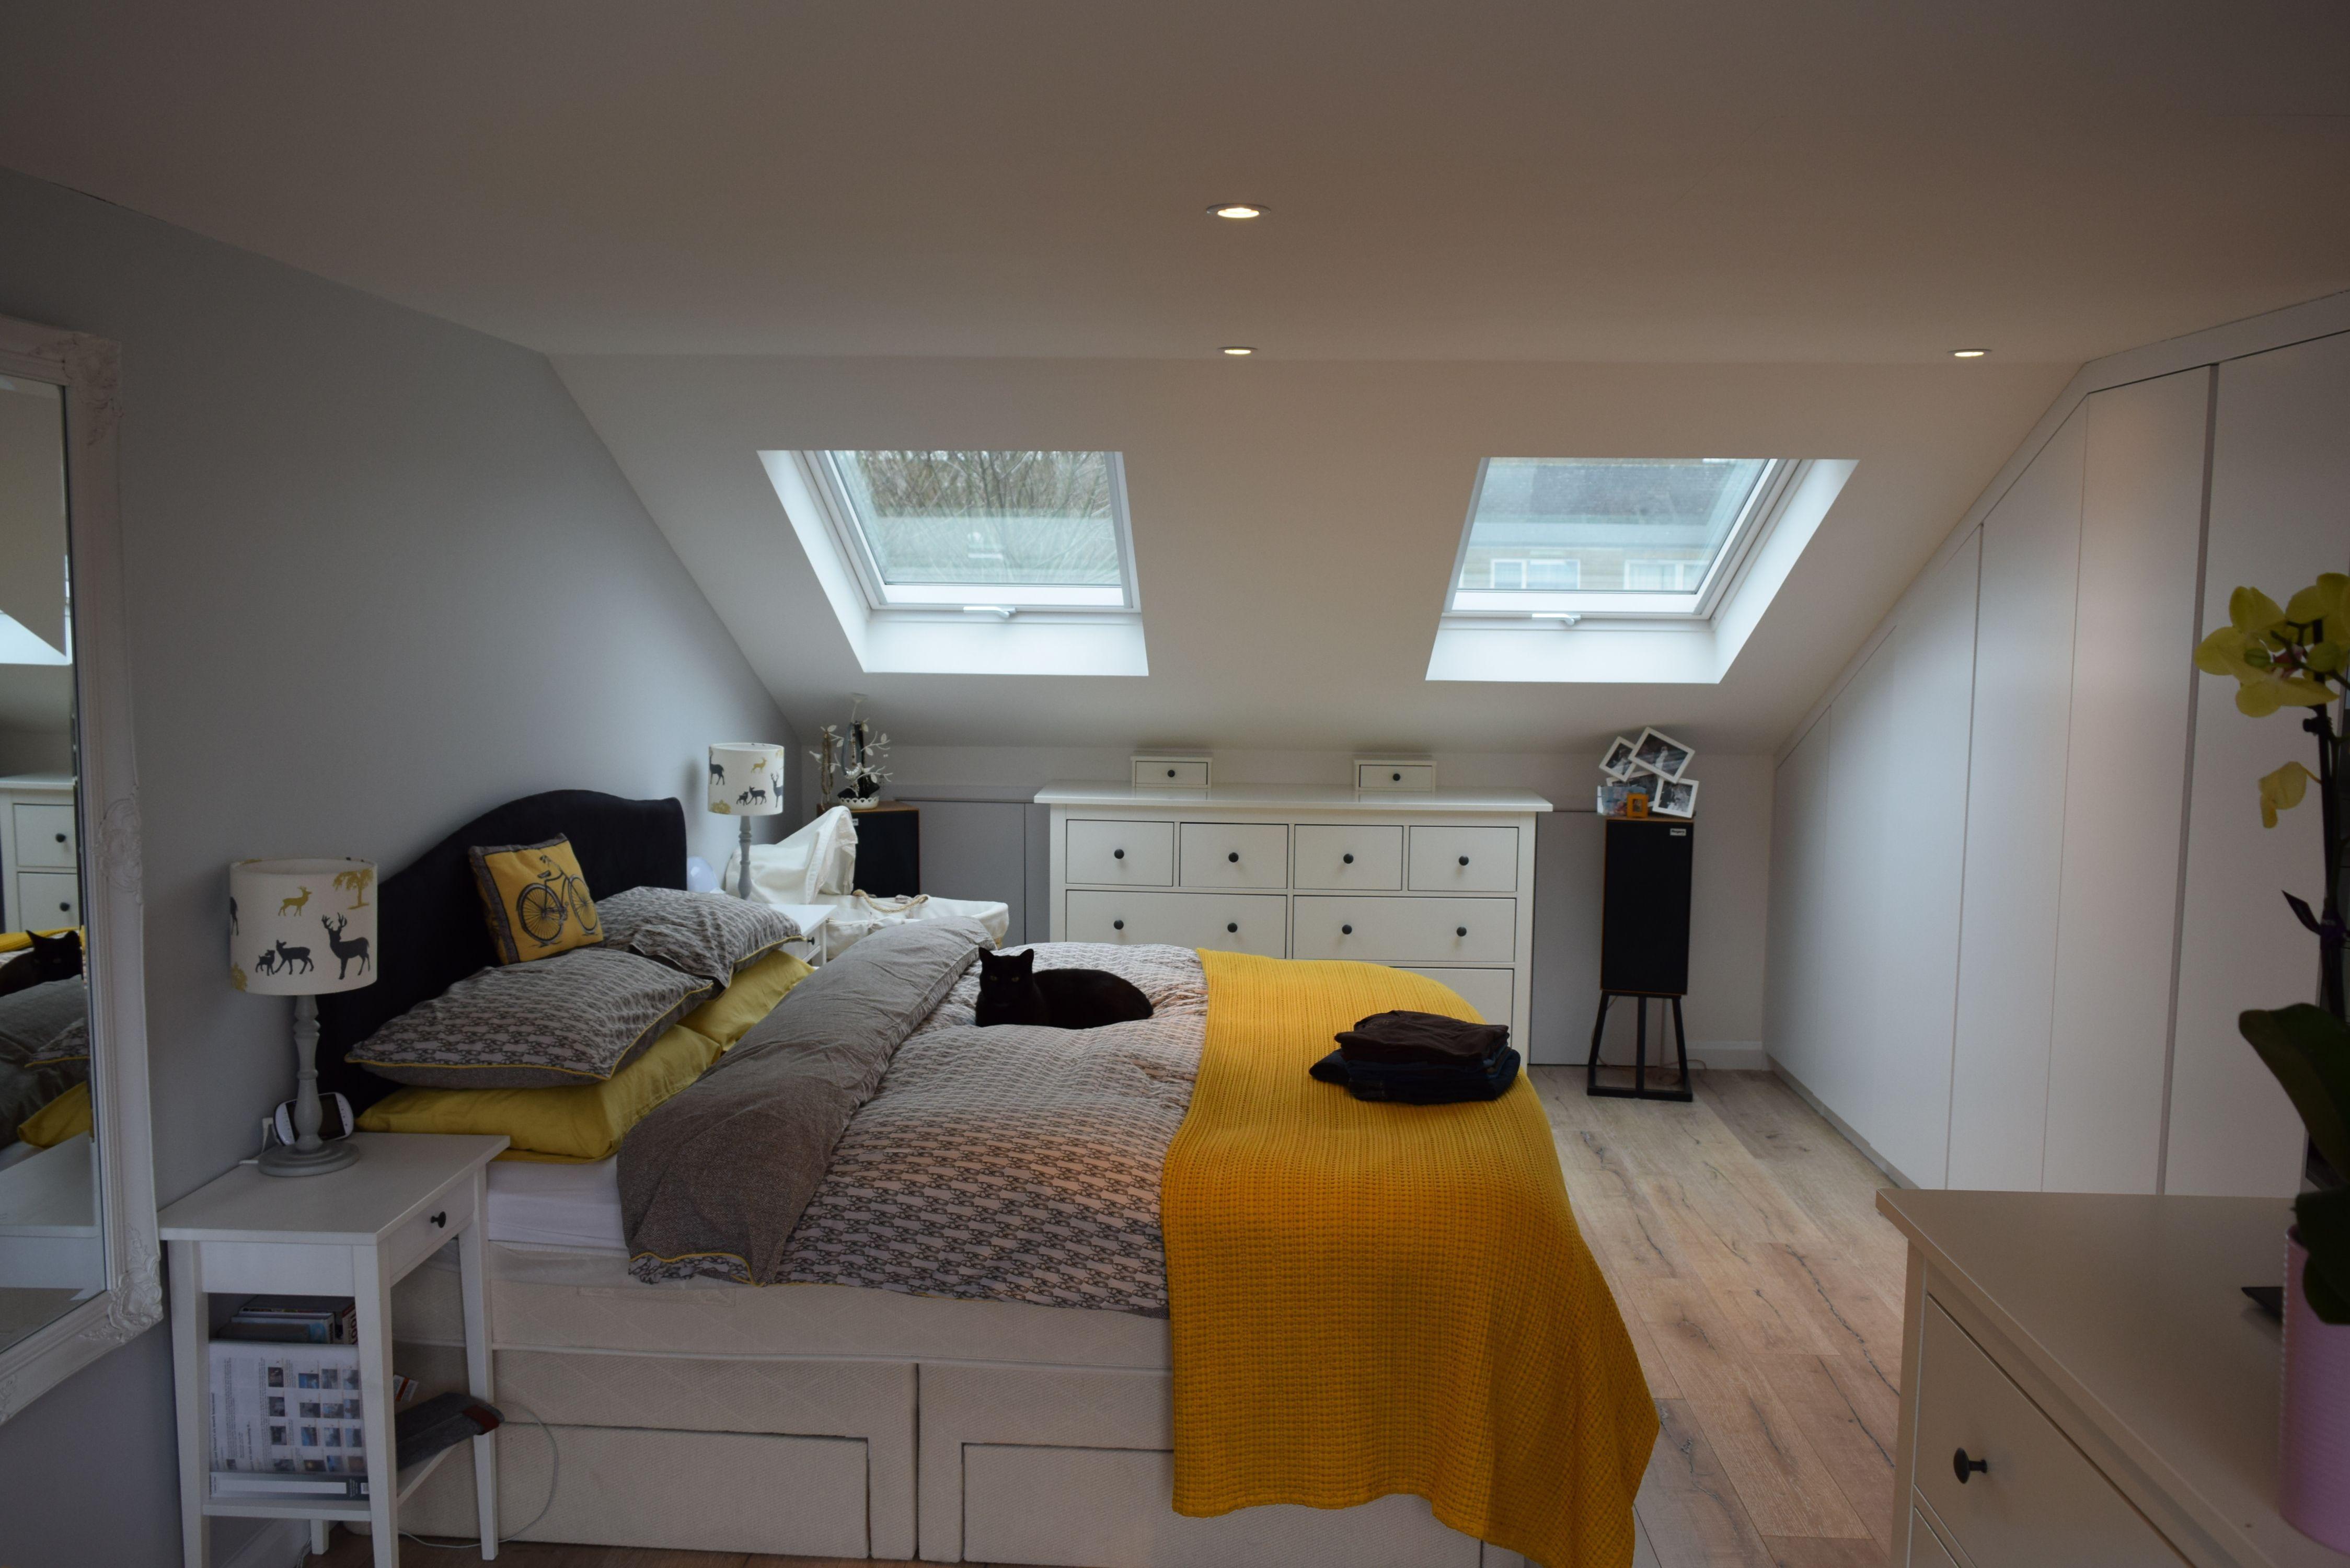 A Single Full Width Rear Dormer Conversion Into One Bedroom And One Bathroom Ash Island Lofts Bed Small Loft Bedroom Small Loft Spaces Attic Bedroom Designs